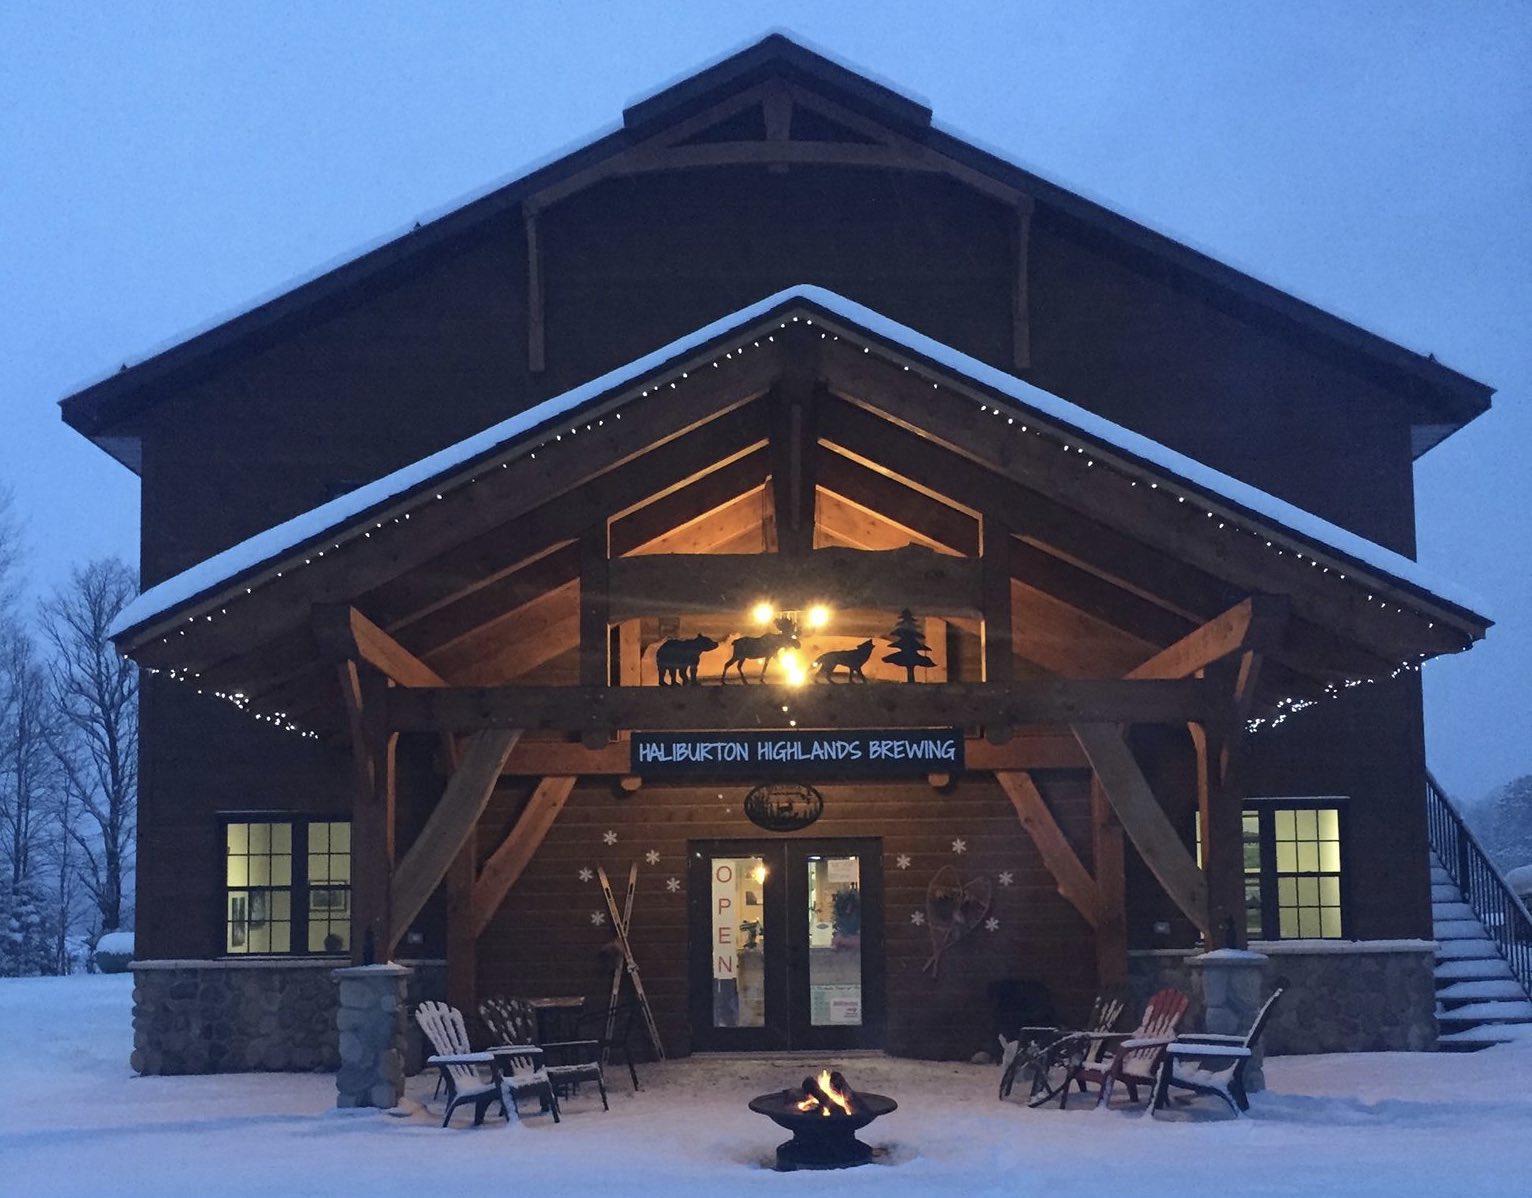 Haliburton Brewing Company's location in winter is one the best Haliburton breweries